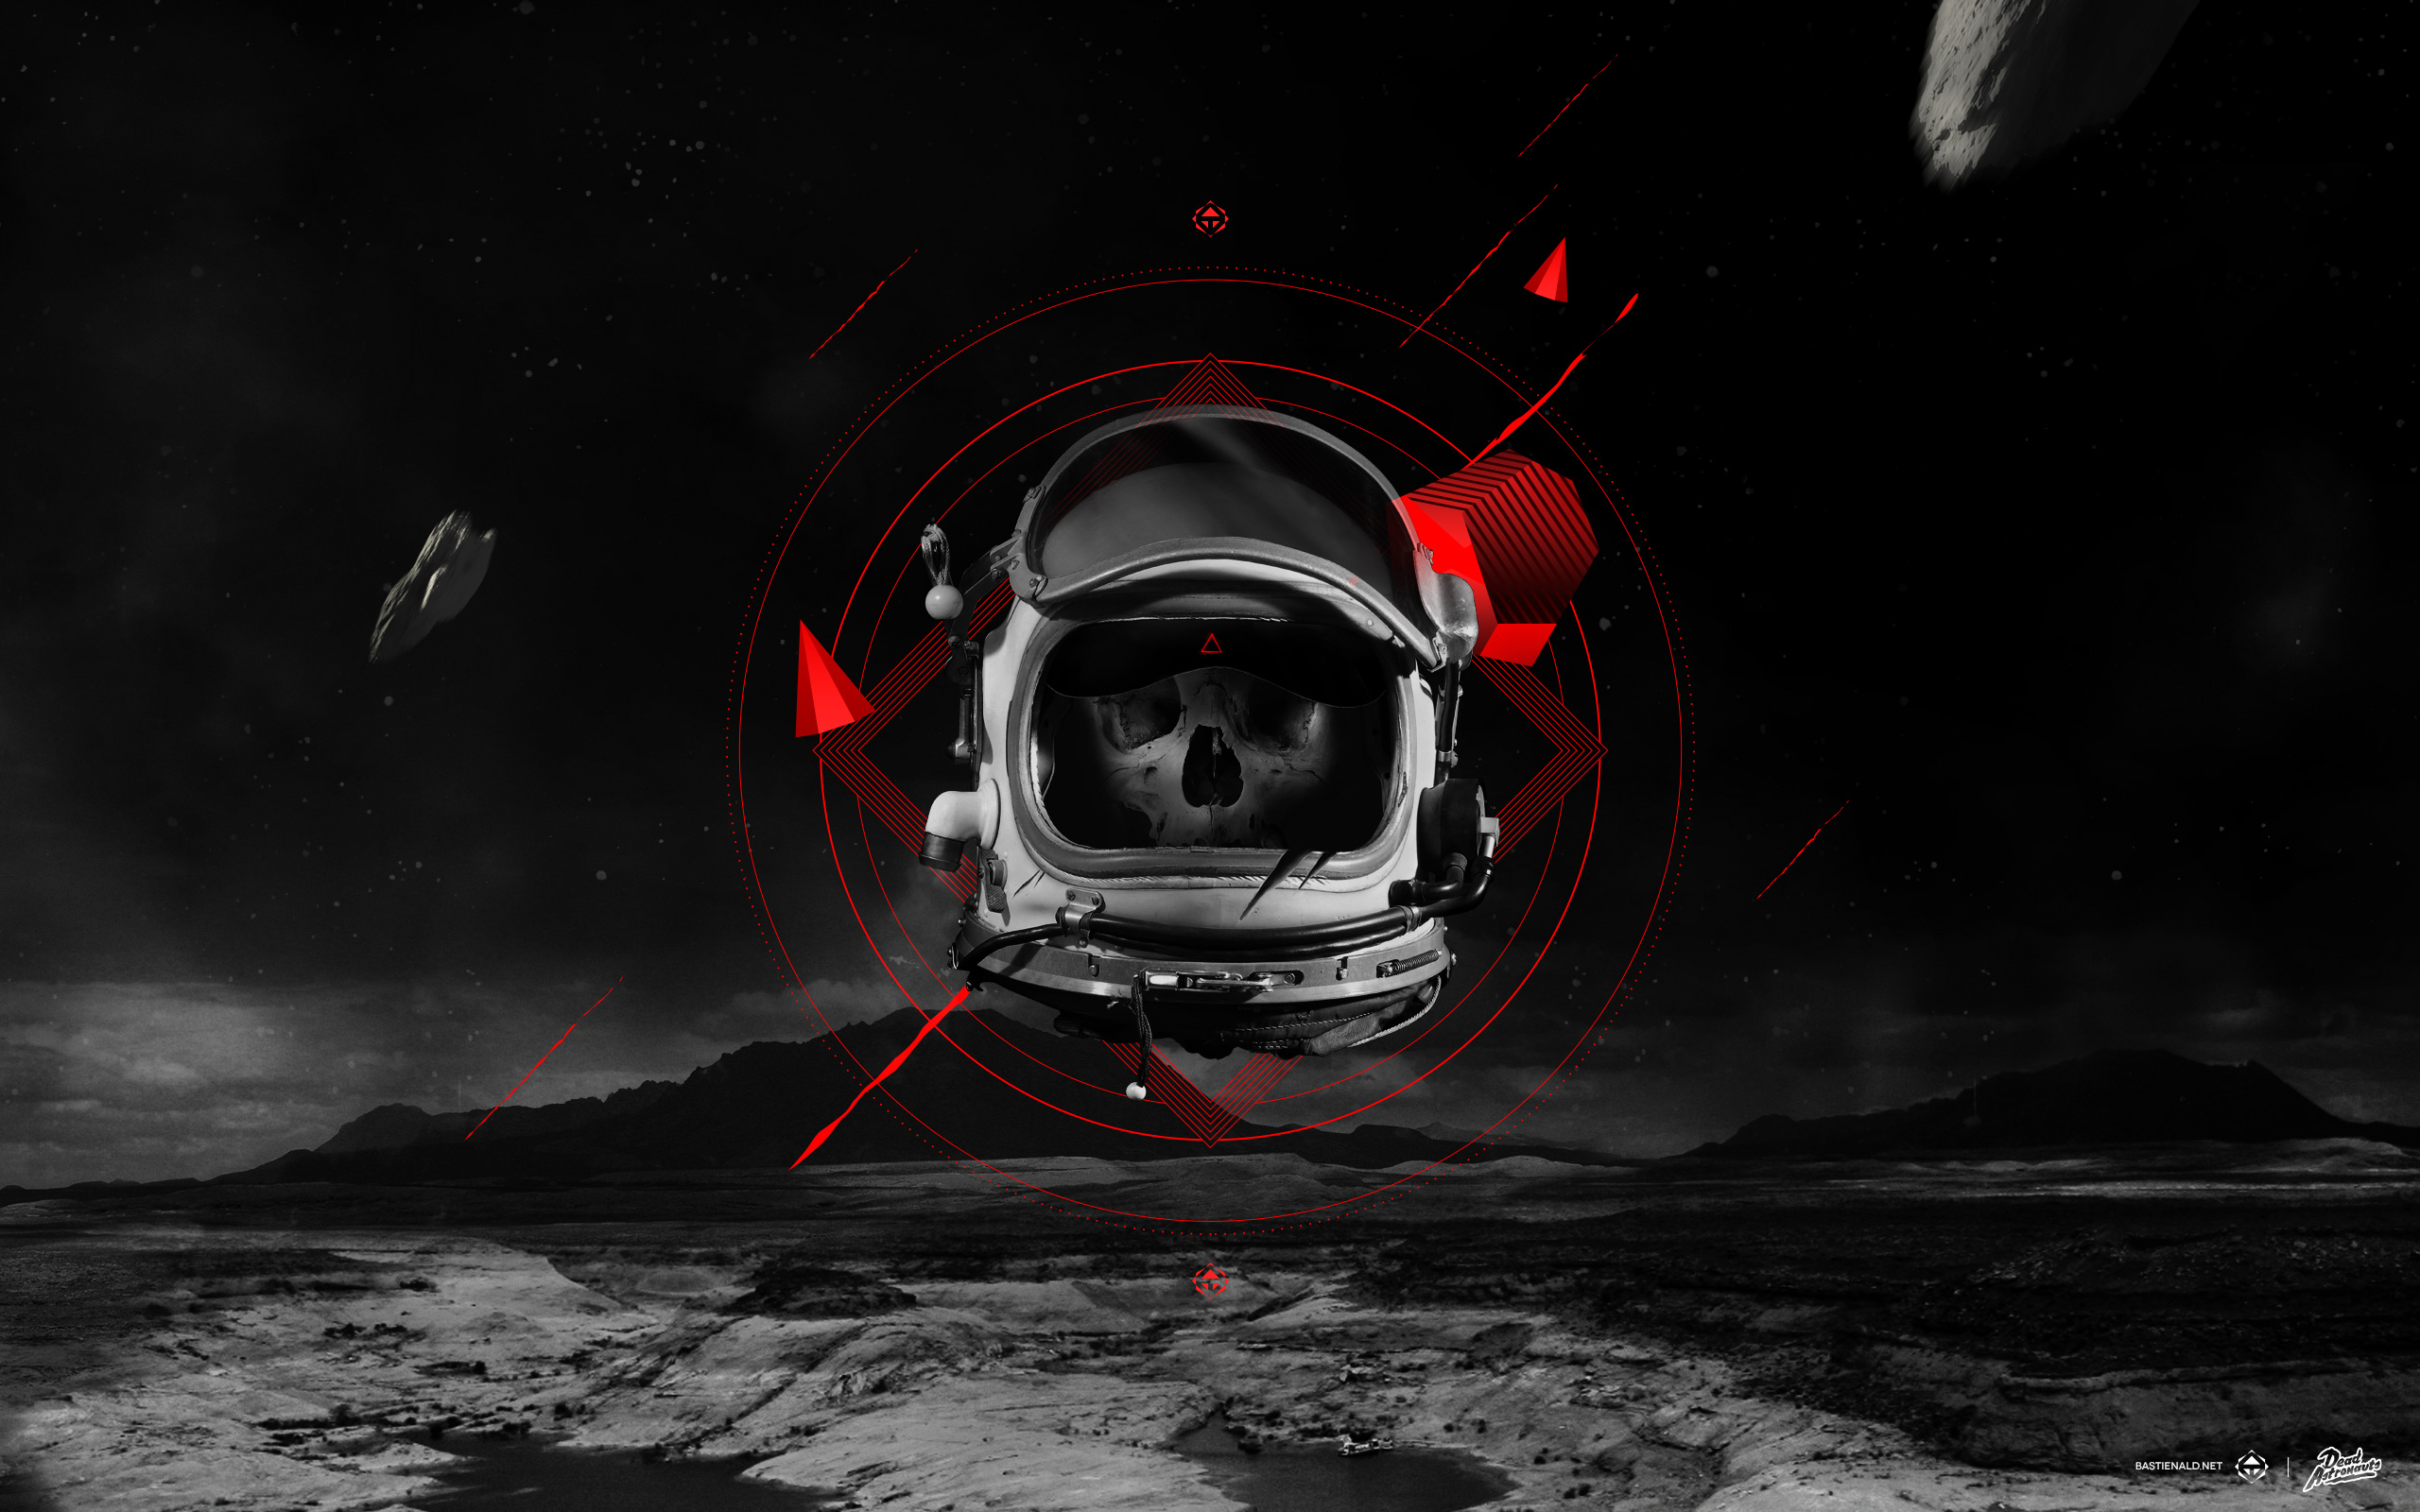 Dead Astronaut Wallpaper By Bastienald On Deviantart